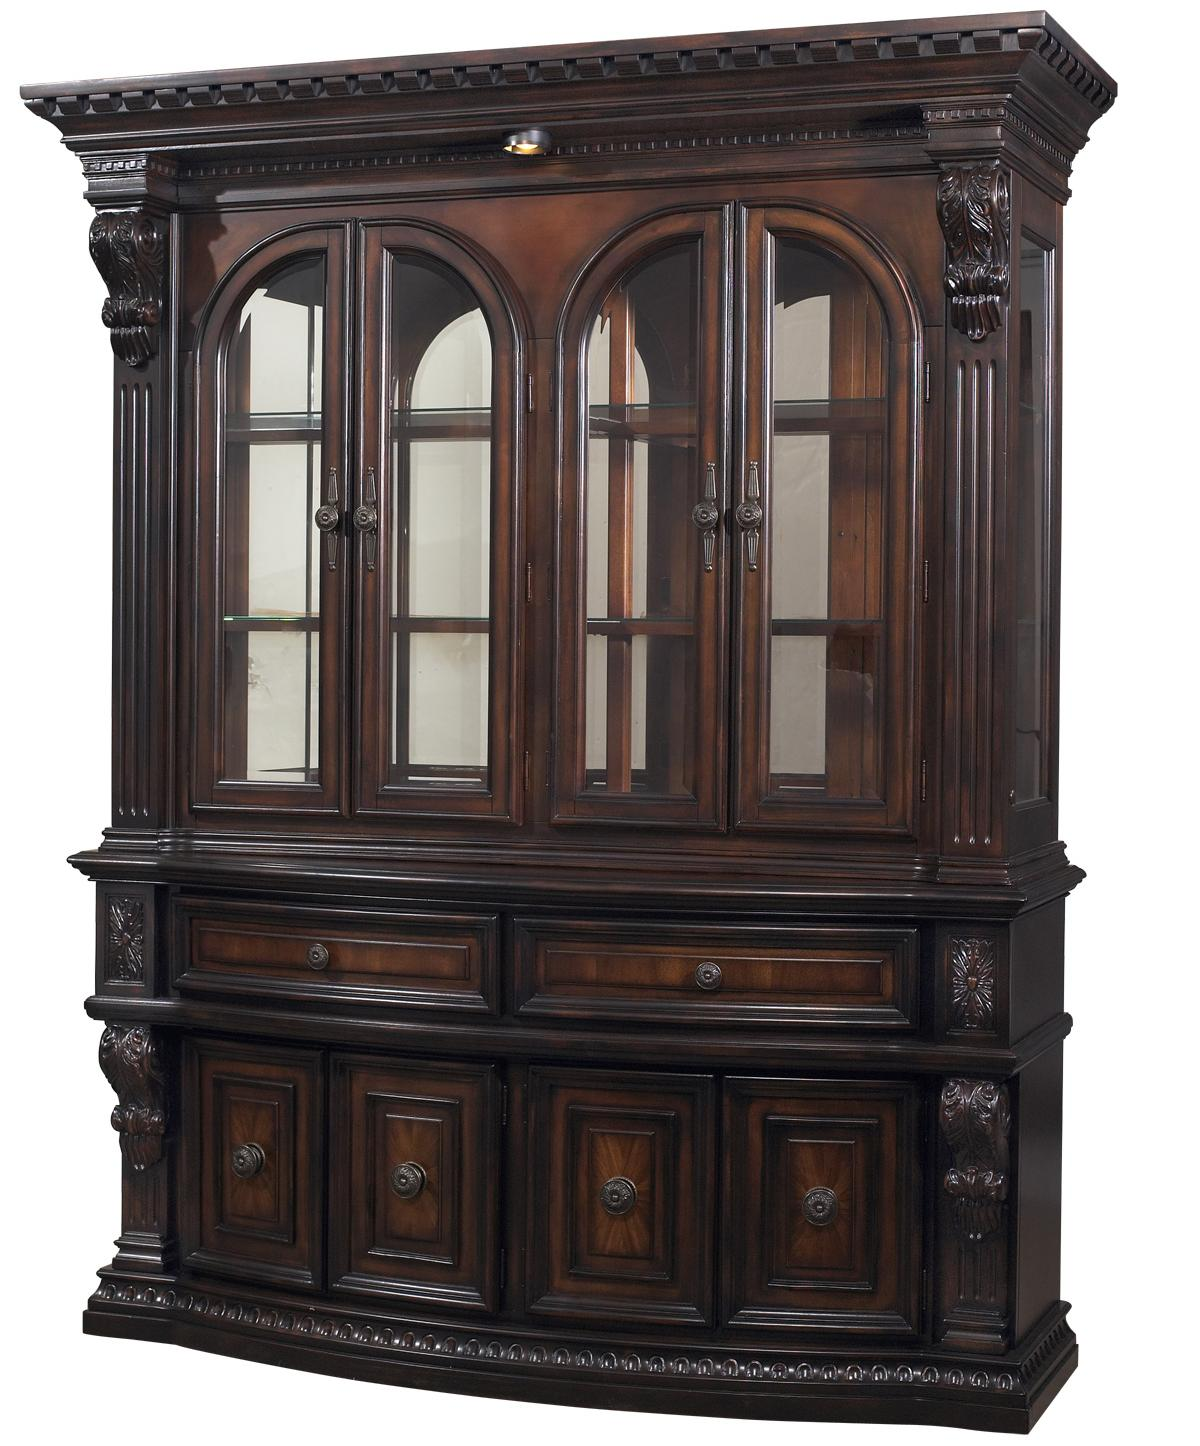 Fairmont Designs Grand Estates China Cabinet Hutch | Royal ...